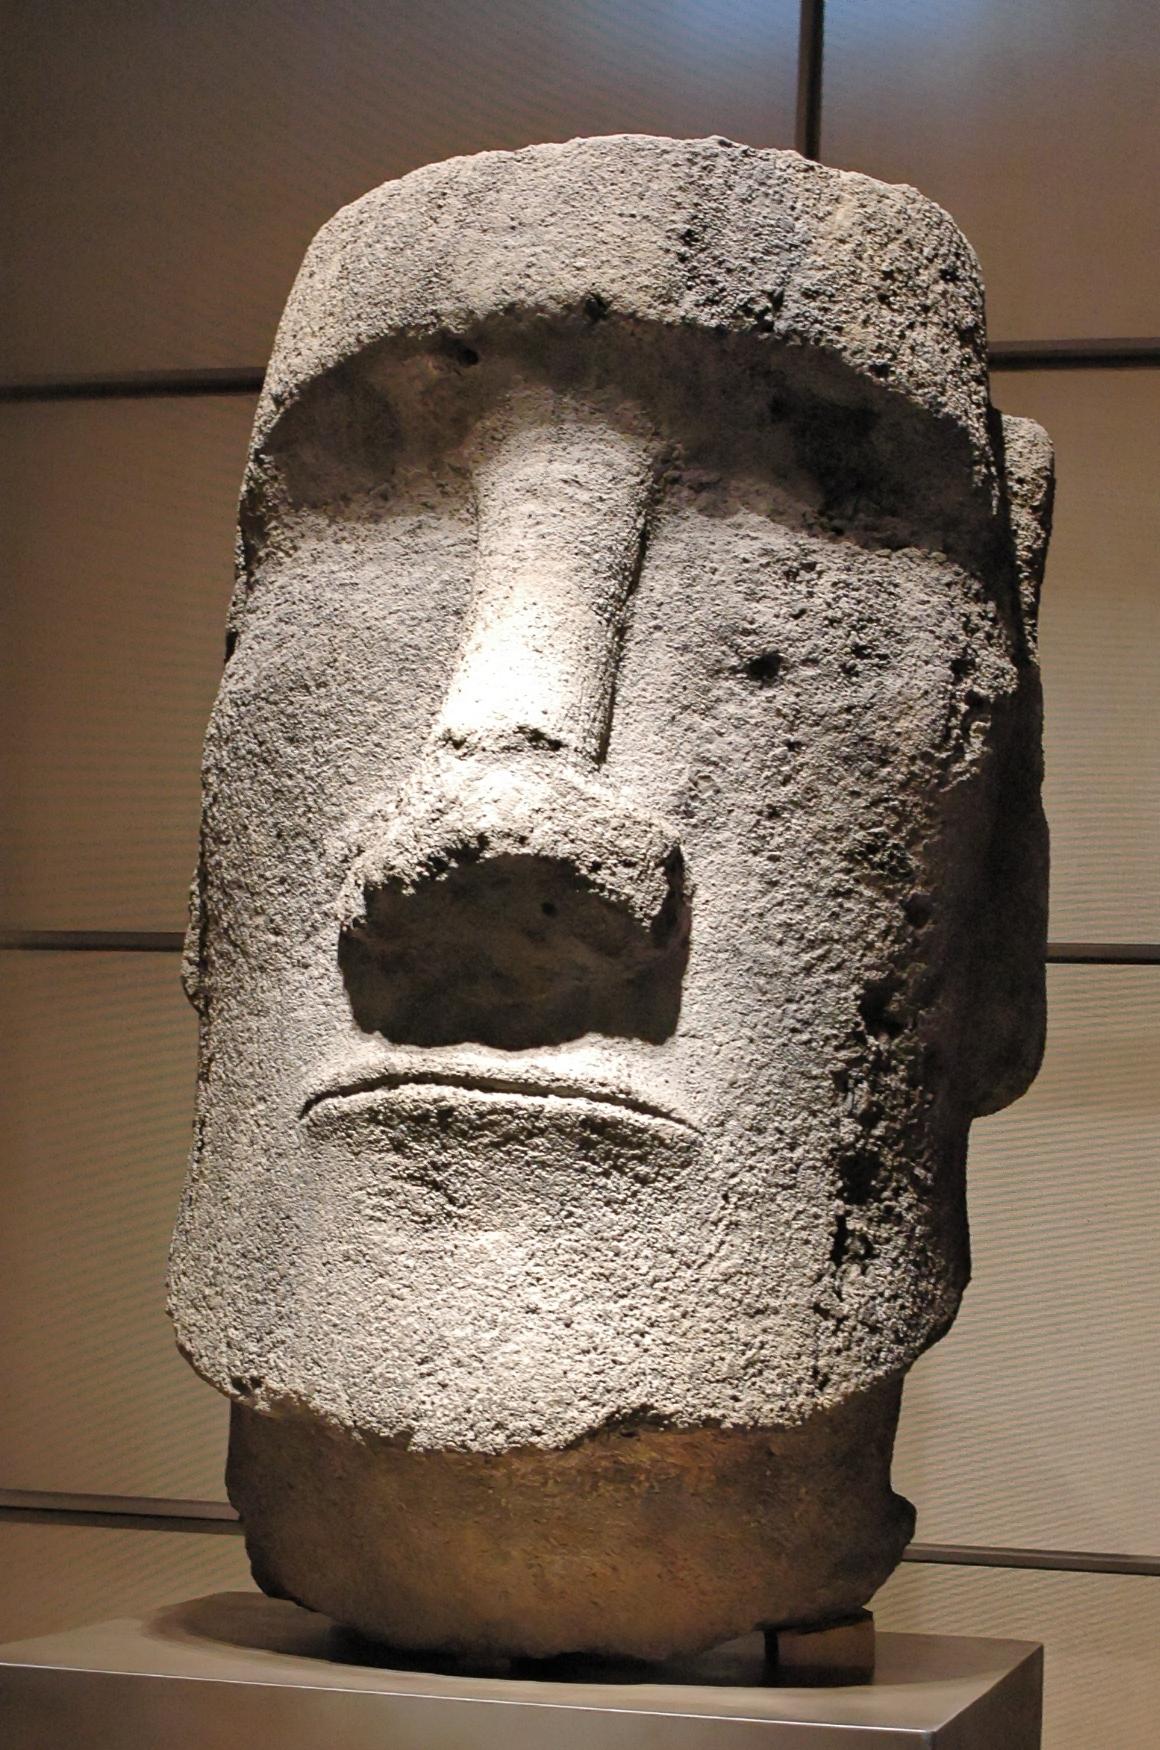 Moai_Easter_Island_InvMH-35-61-1.jpg